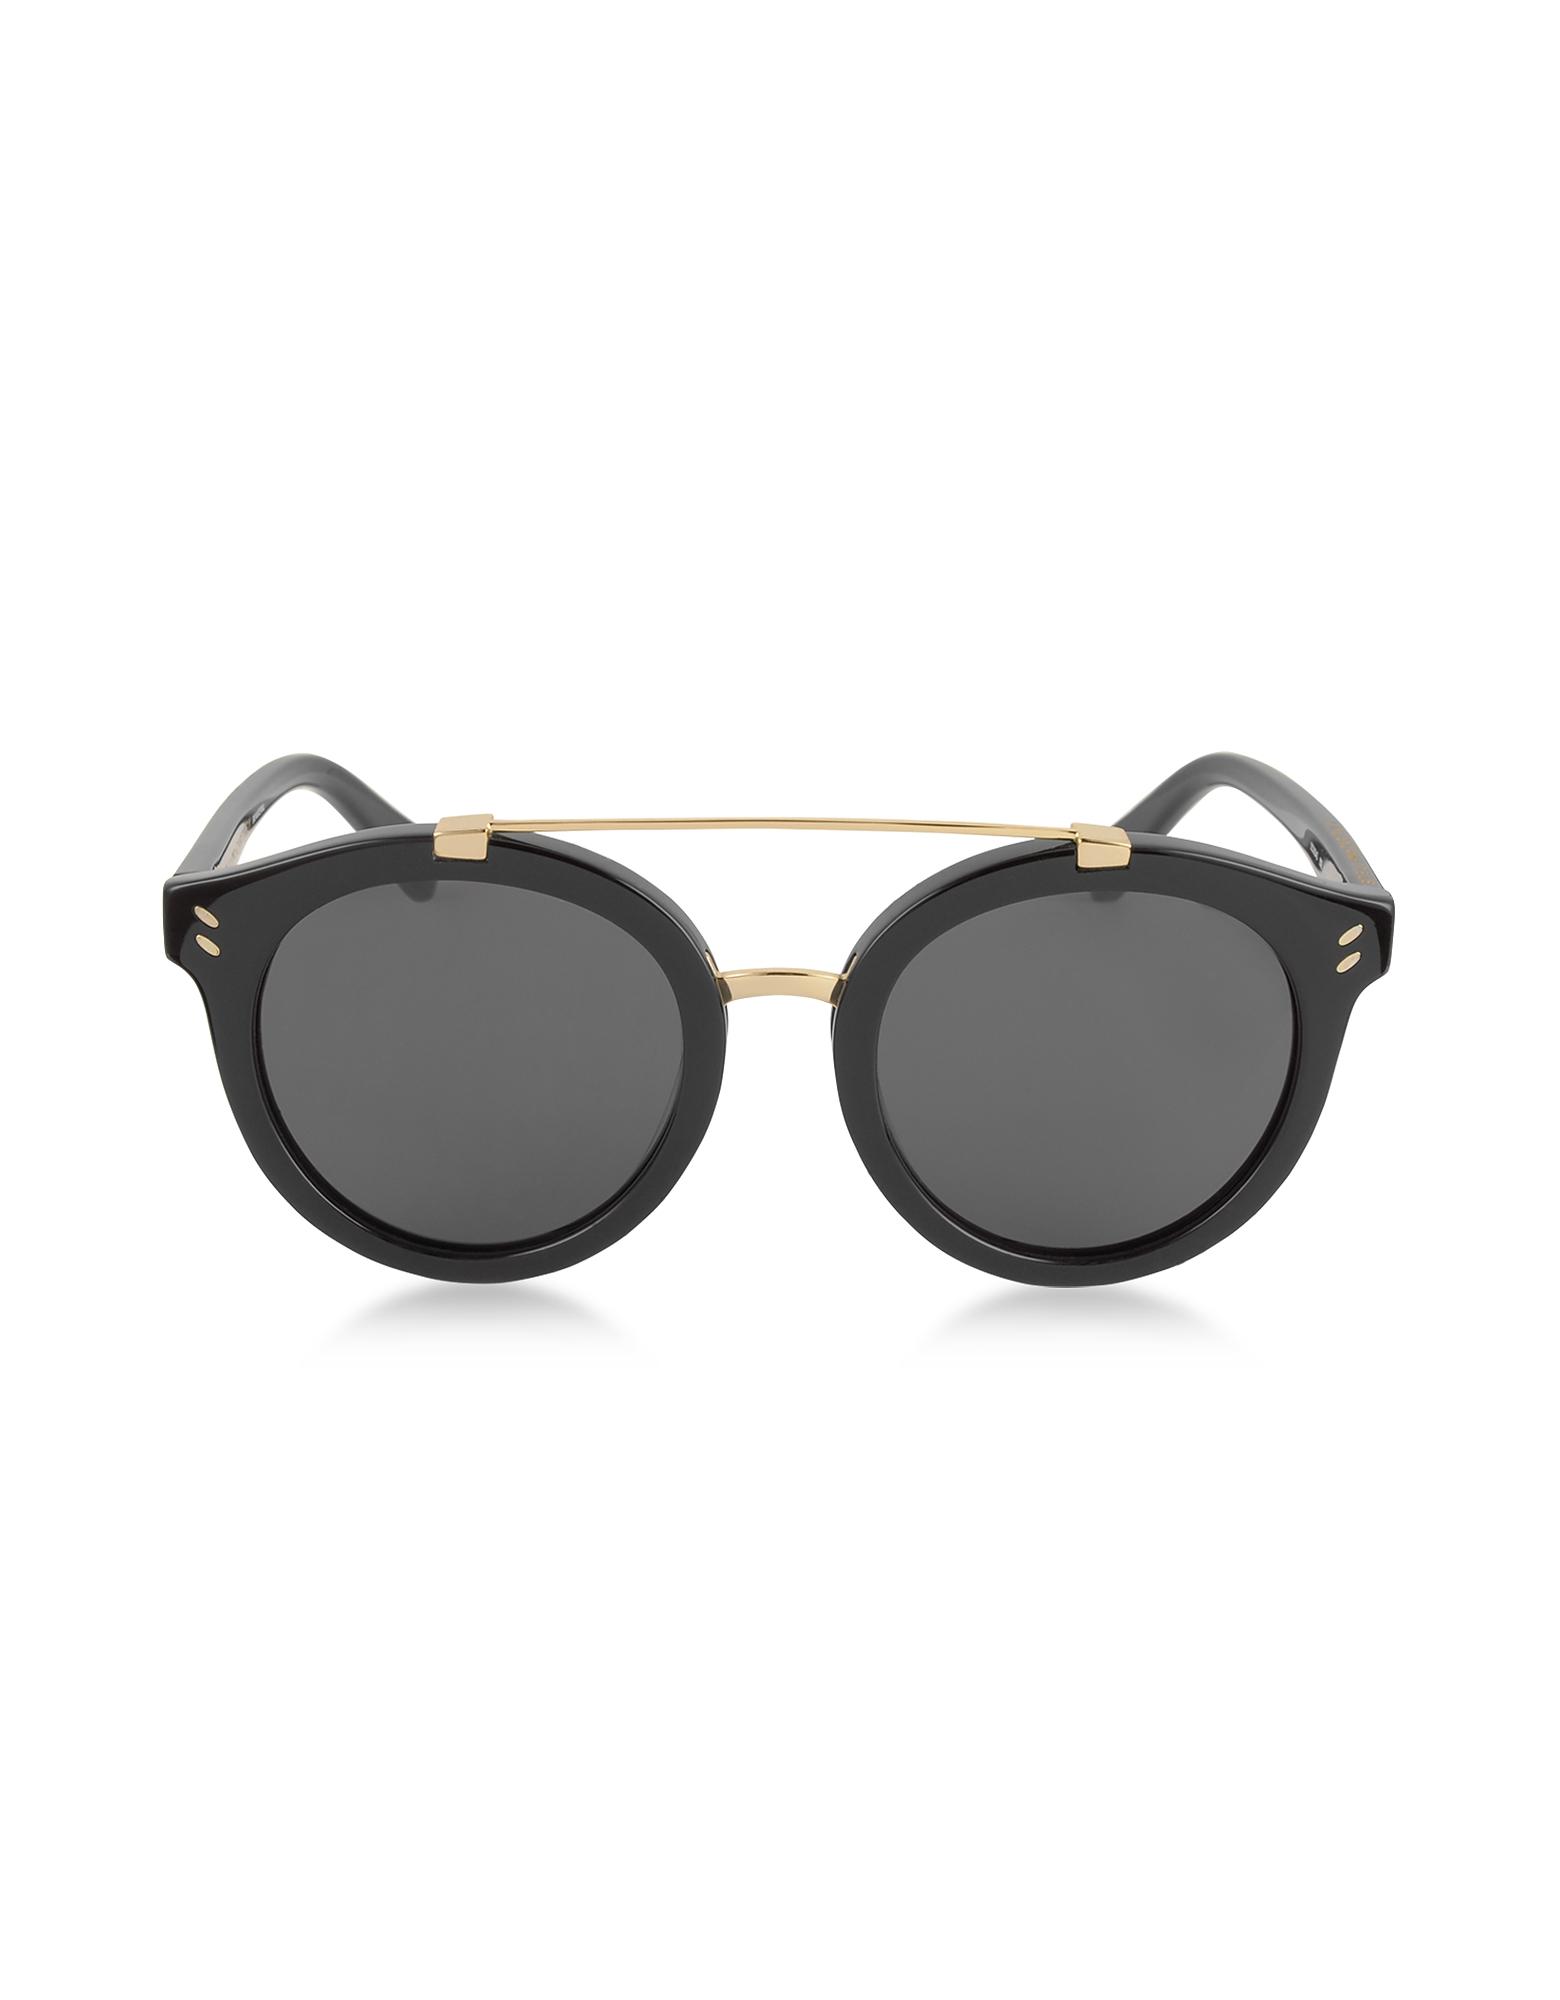 Stella McCartney Designer Sunglasses, SC0054S Round Aviator Acetate Women's Sunglasses